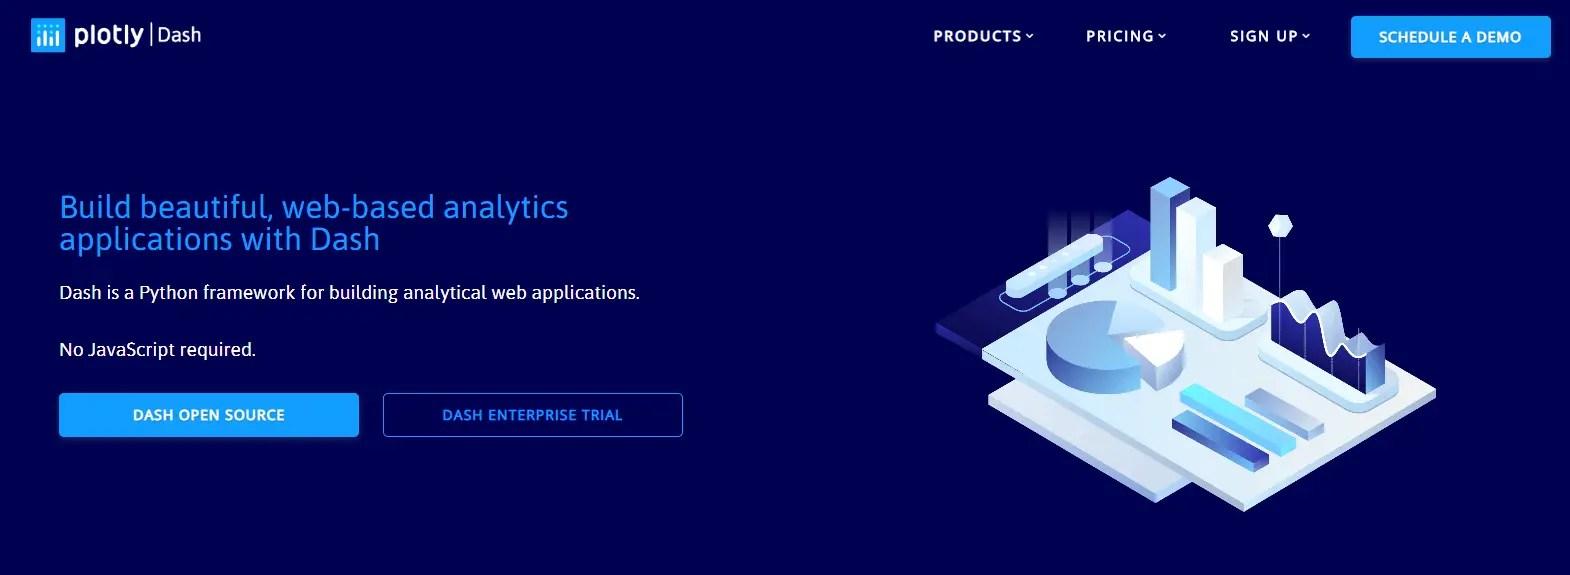 Best Python Framework for Web Applications - Data Science Learner